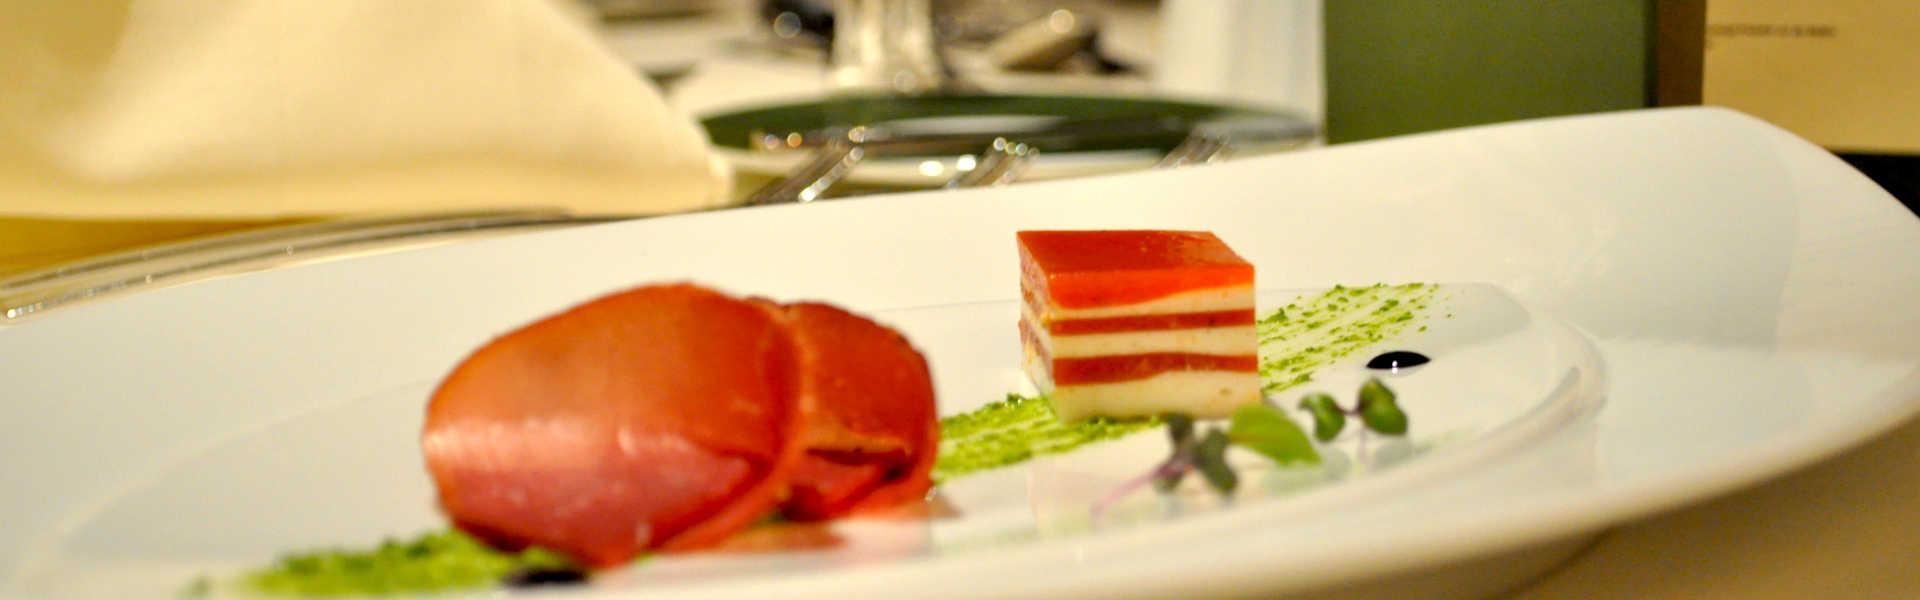 Kulinarik - Menü - Headerbild